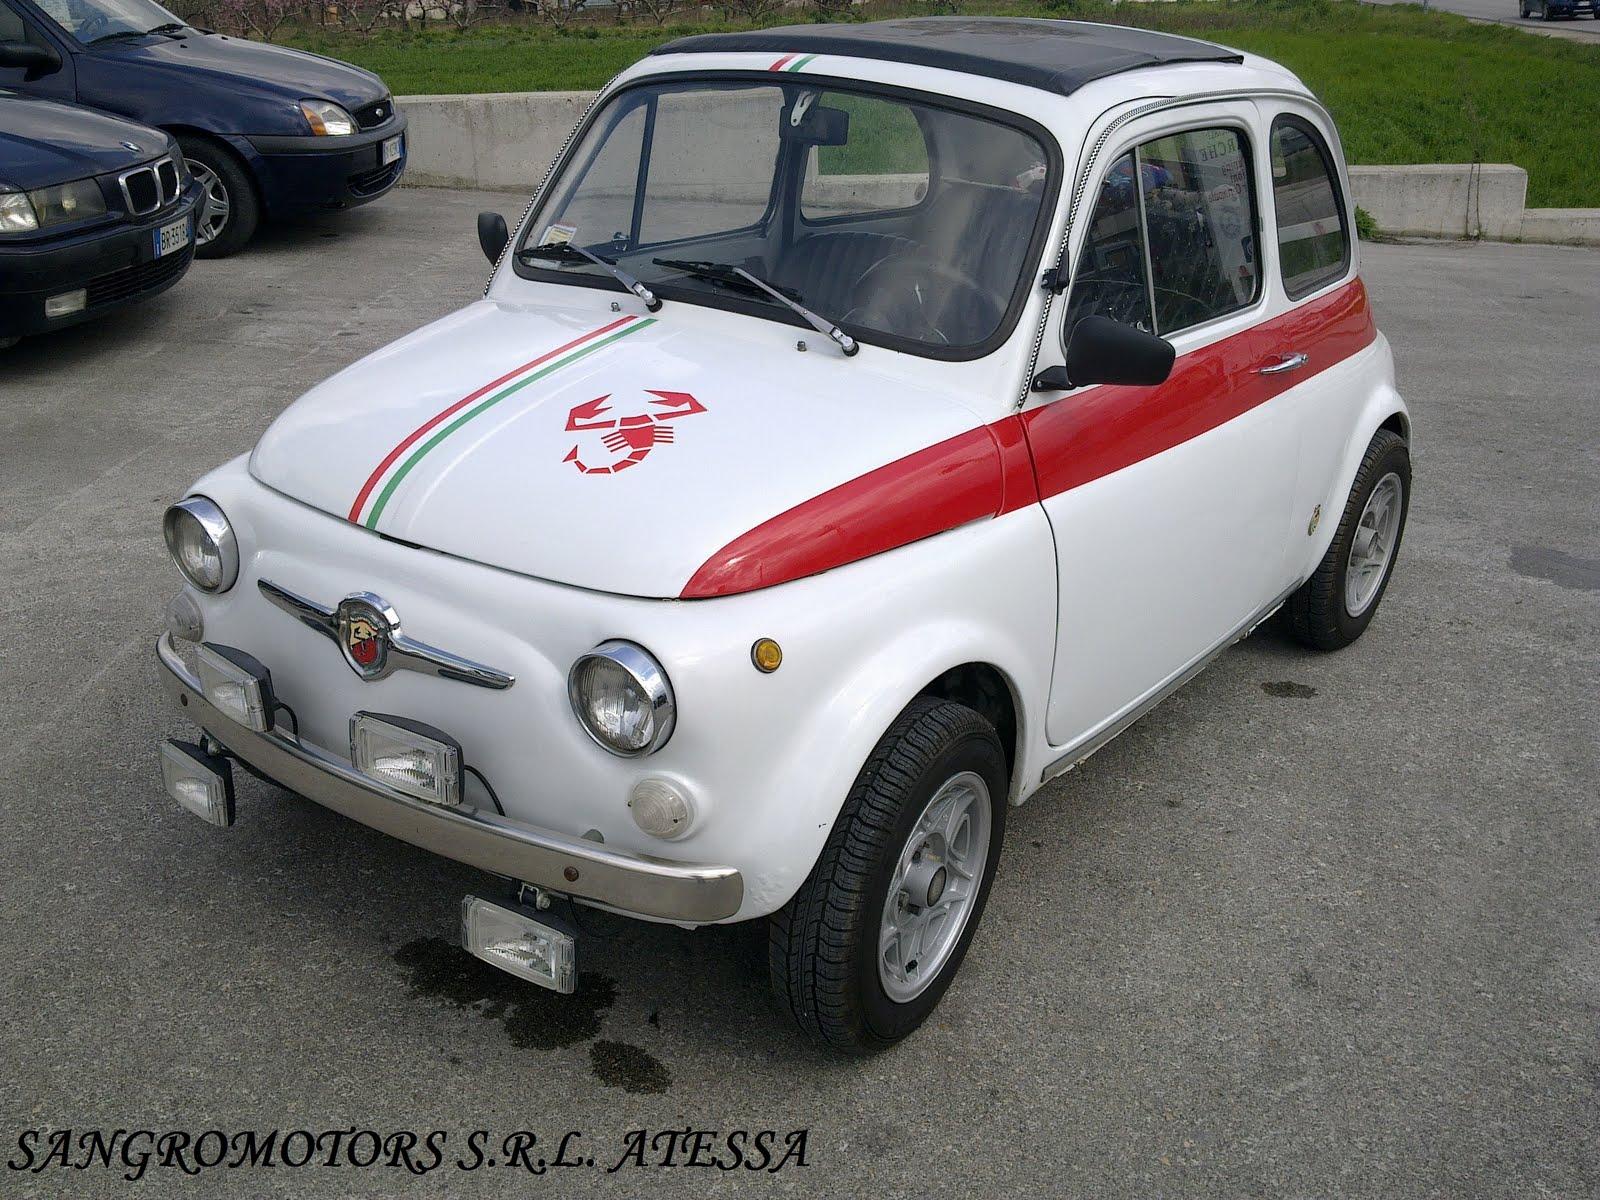 Sangromotors S R L Auto Nuove Usate E Storiche Fiat 500